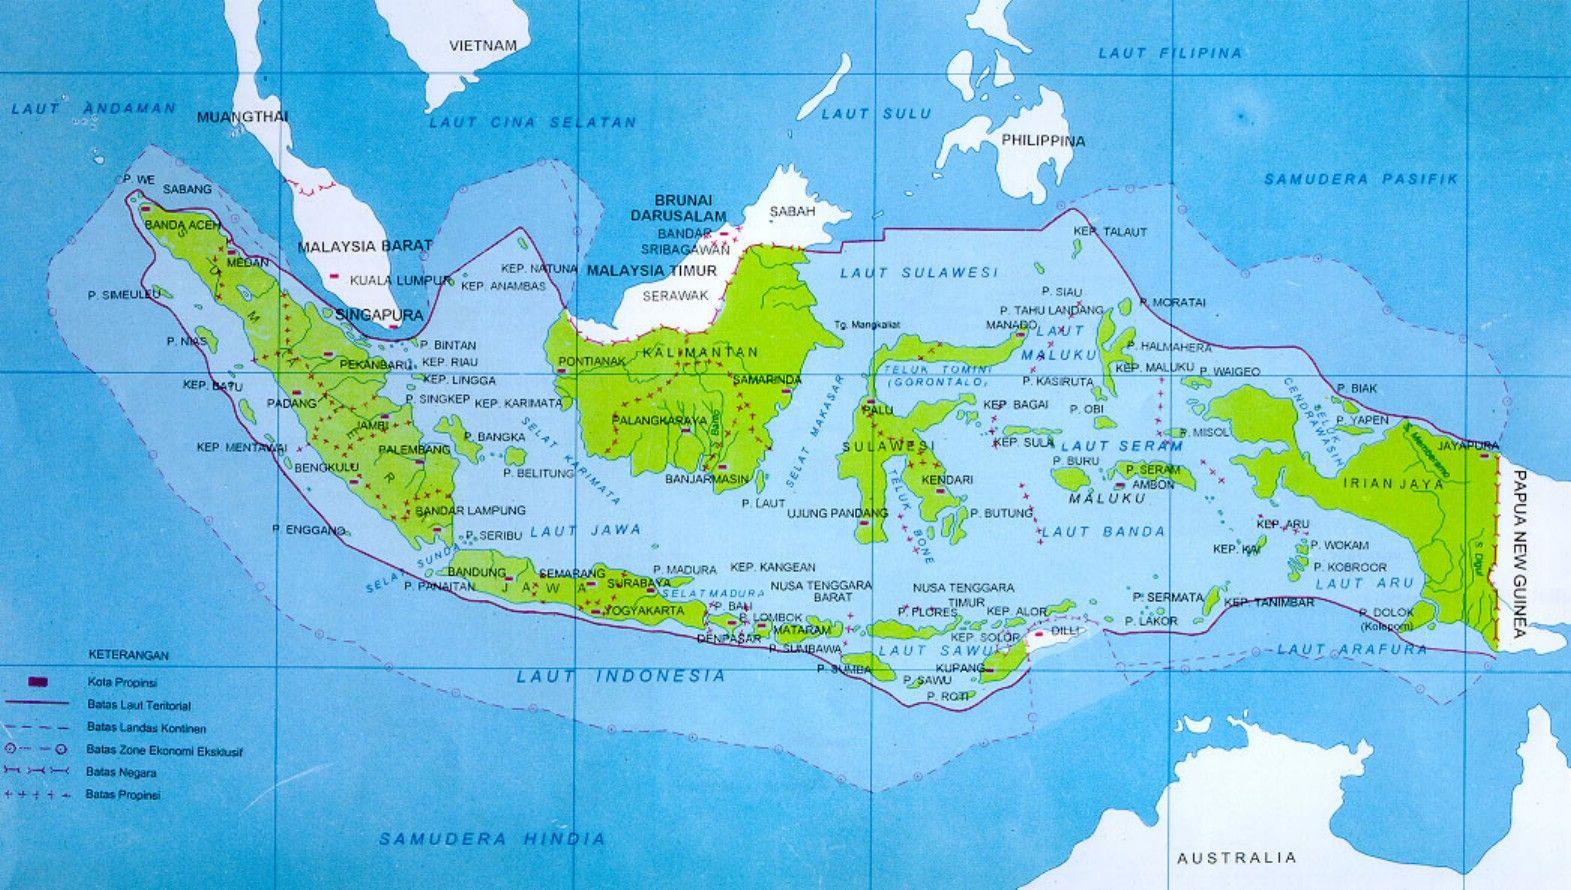 peta indonesia jpg 1571 890 gambar indonesia kartografi peta indonesia jpg 1571 890 gambar